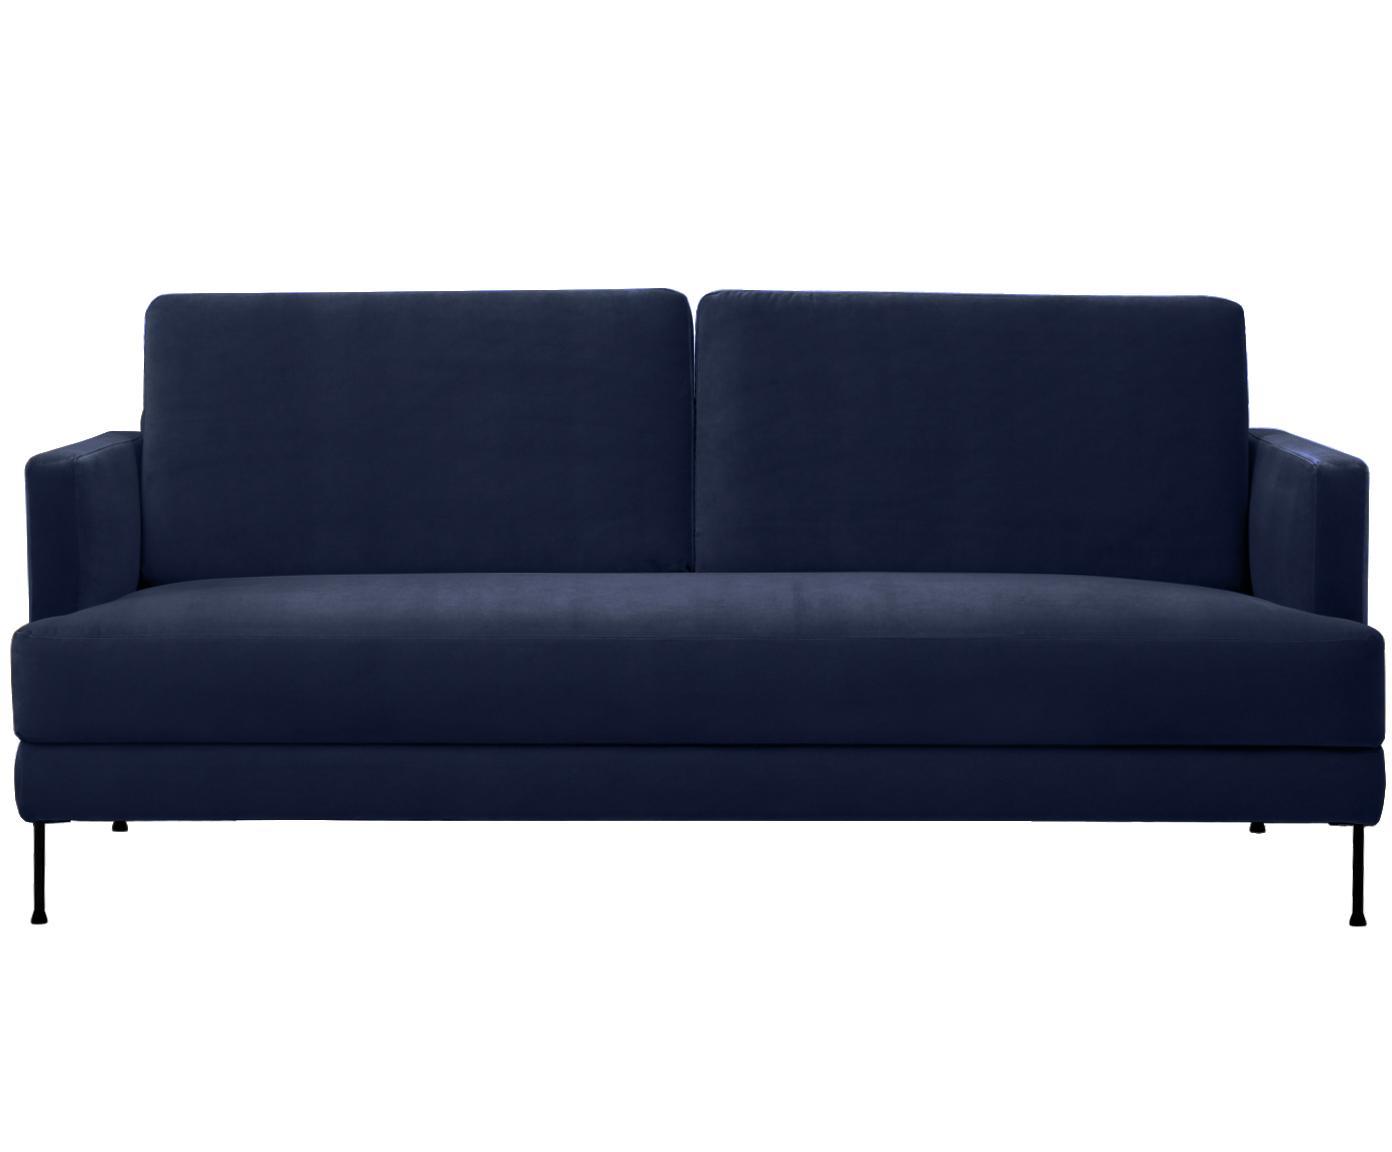 Fluwelen bank Fluente (3-zits), Bekleding: fluweel (hoogwaardig poly, Frame: massief grenenhout, Poten: gelakt metaal, Donkerblauw, B 197 x D 83 cm